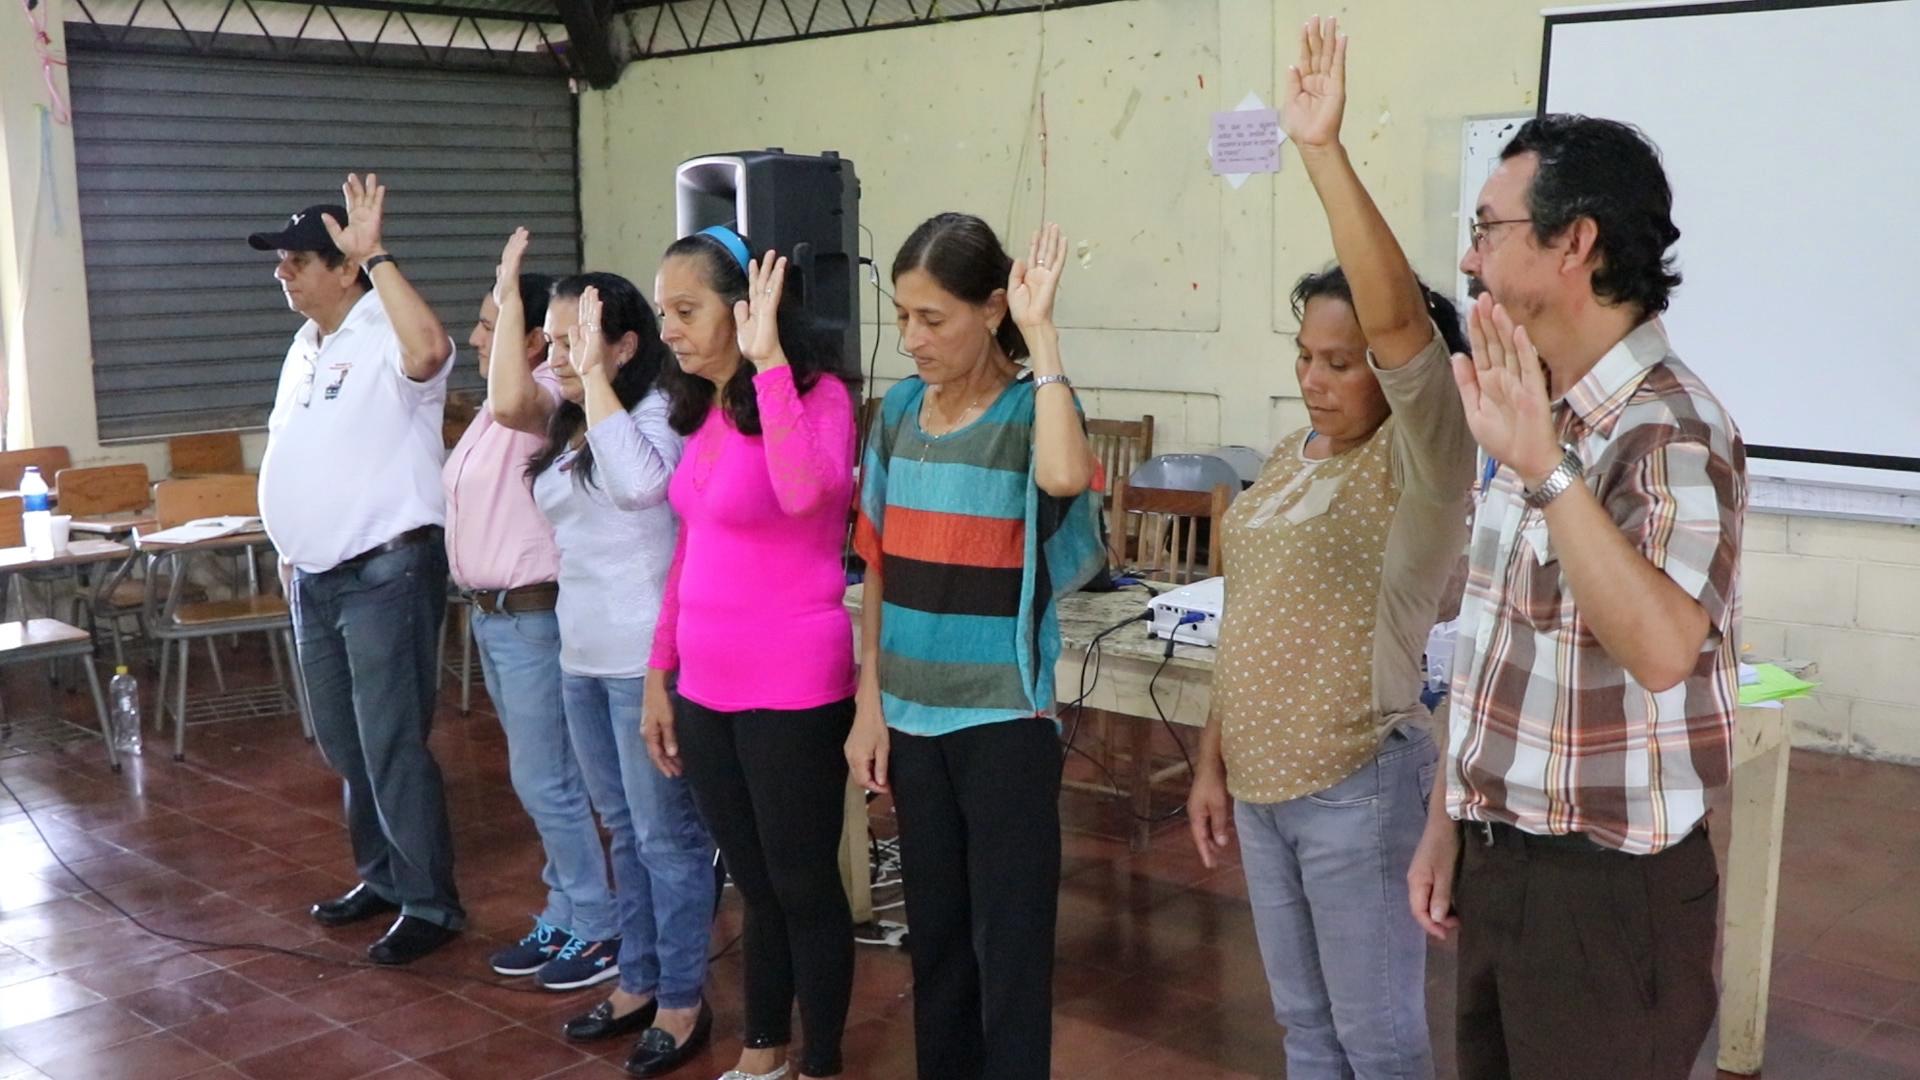 Eleccion Junta  11 Agosto 2017 04.jpg